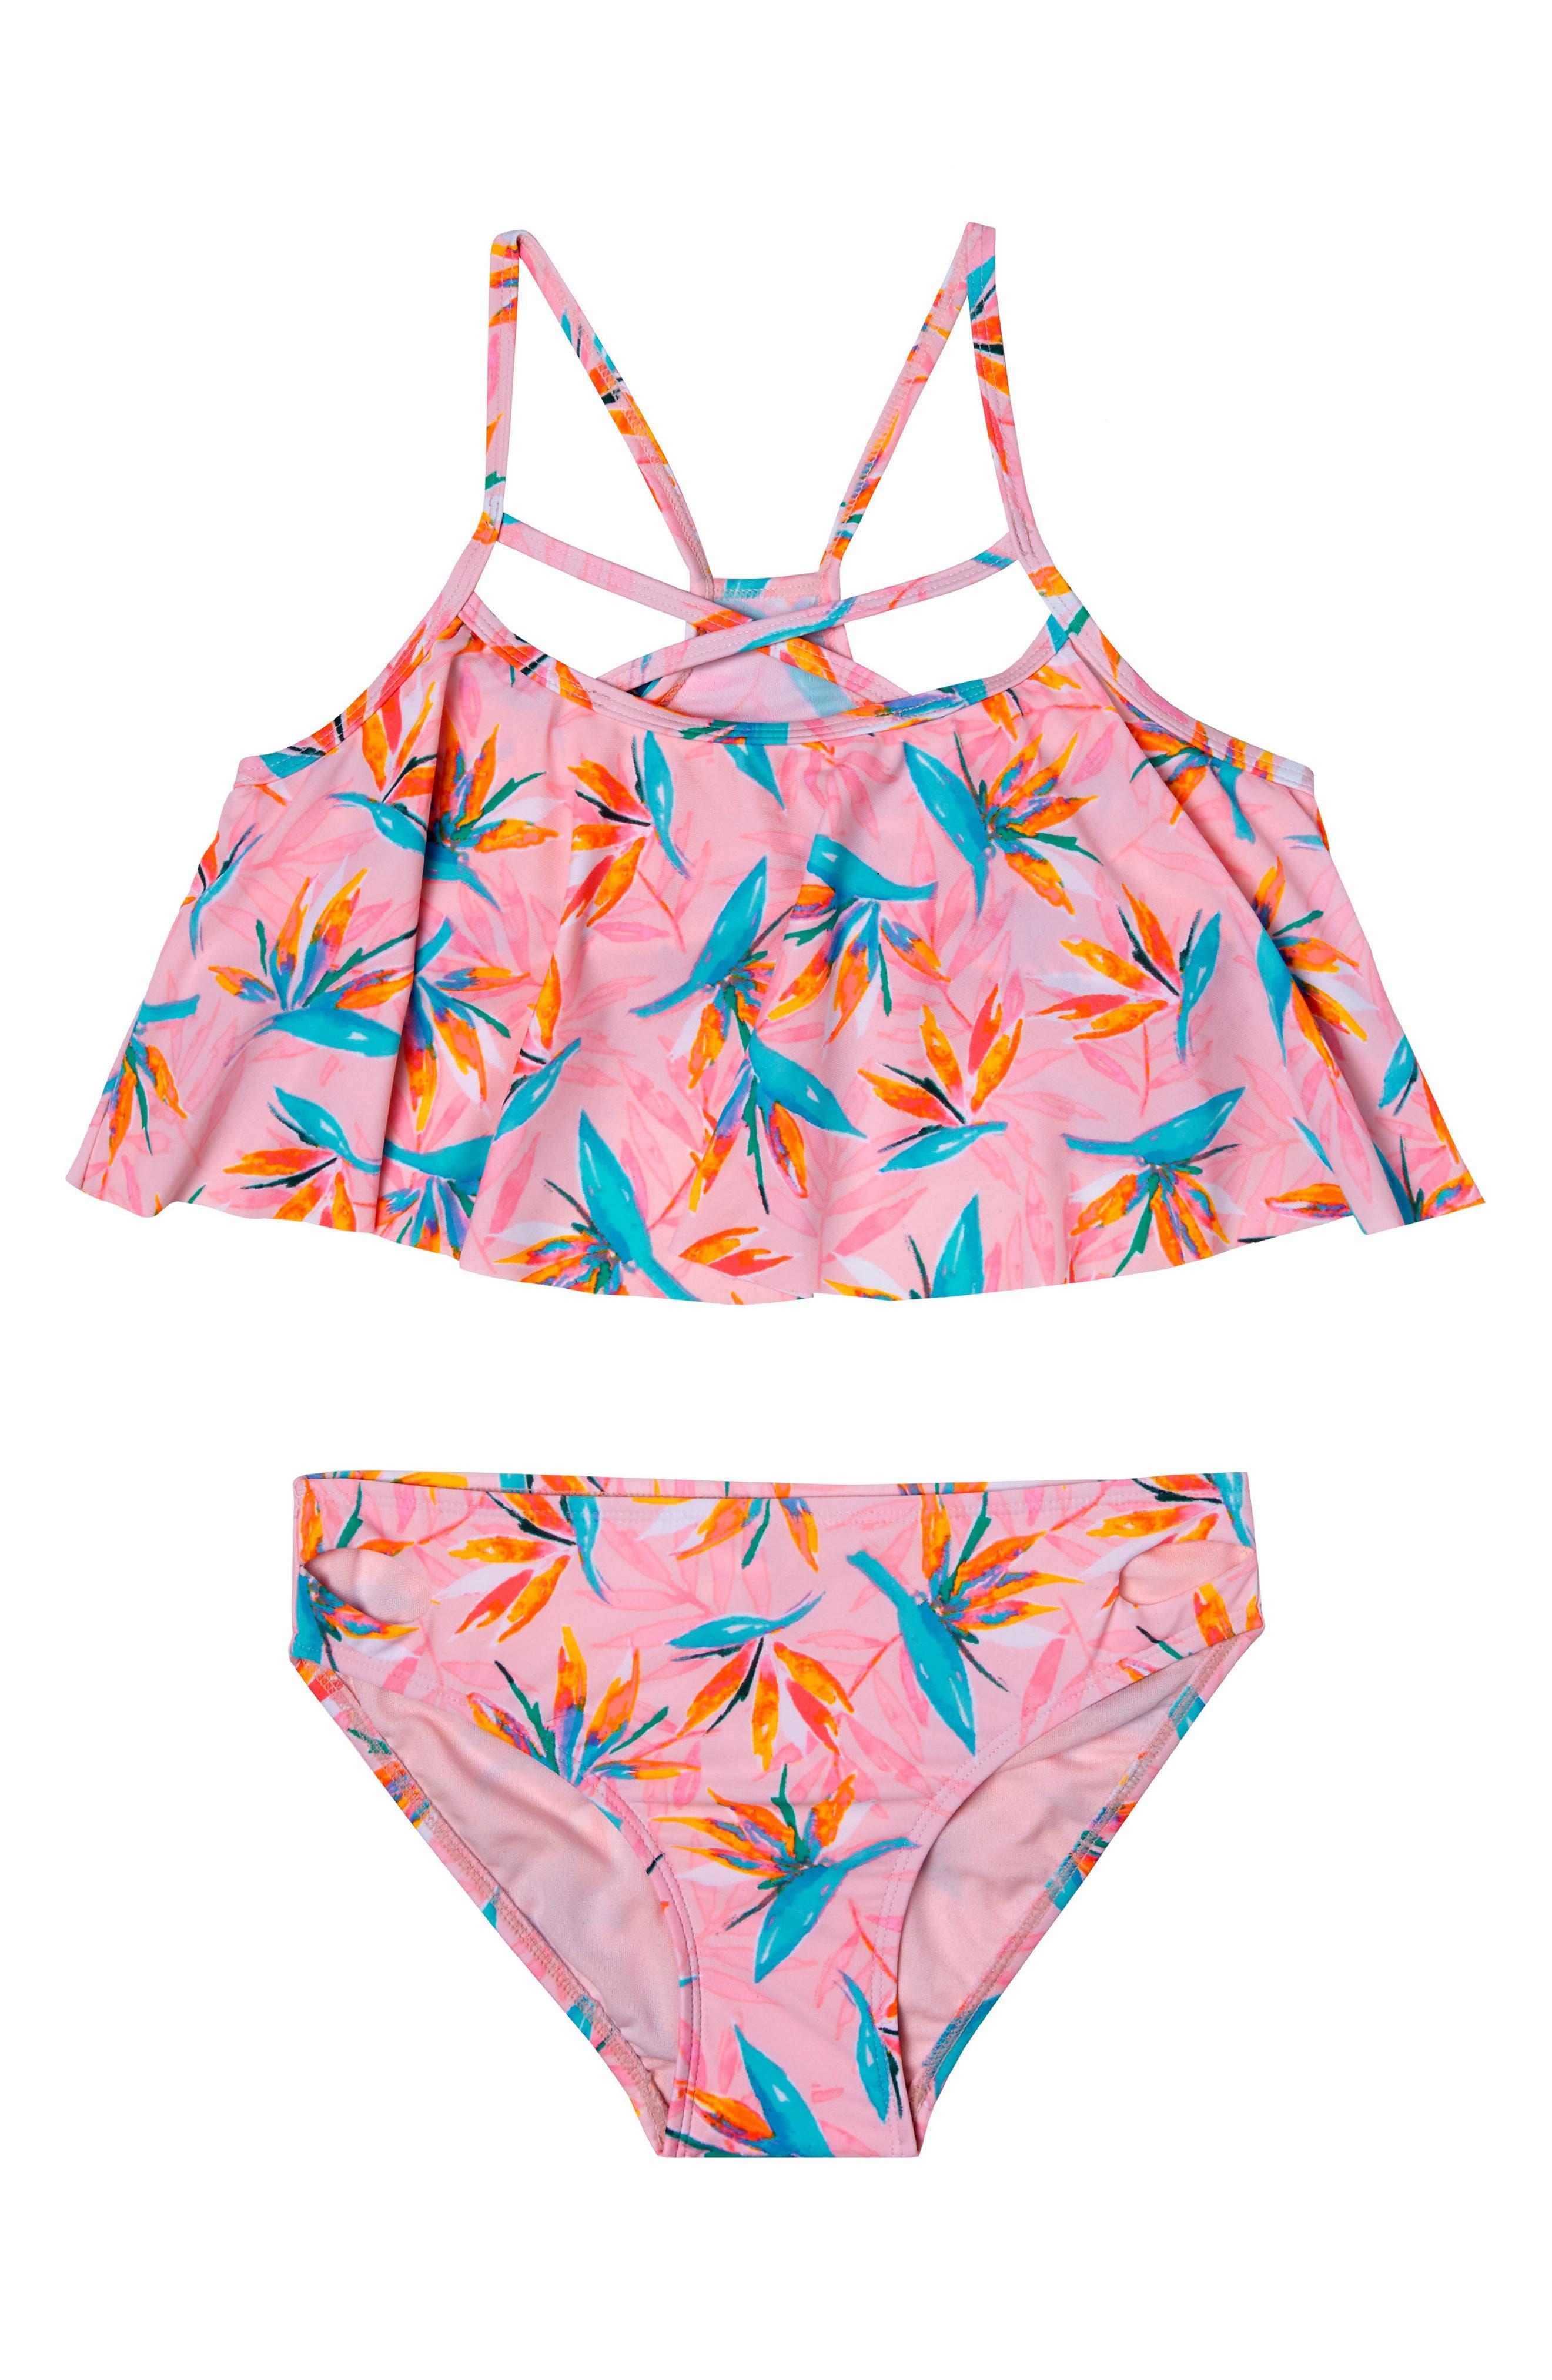 Paradise Haven Two-Piece Swimsuit,                             Main thumbnail 1, color,                             PINK